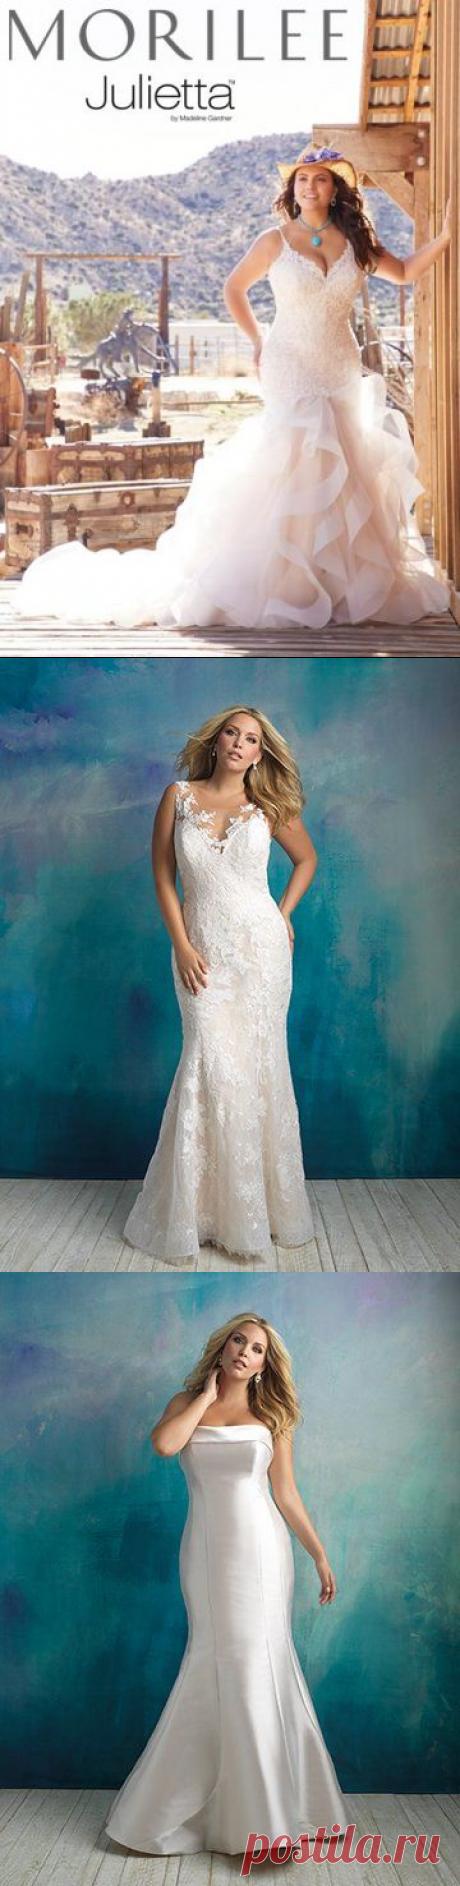 Bridal Boutique - Orland Park, IL - Eva's Bridal International Orland Park